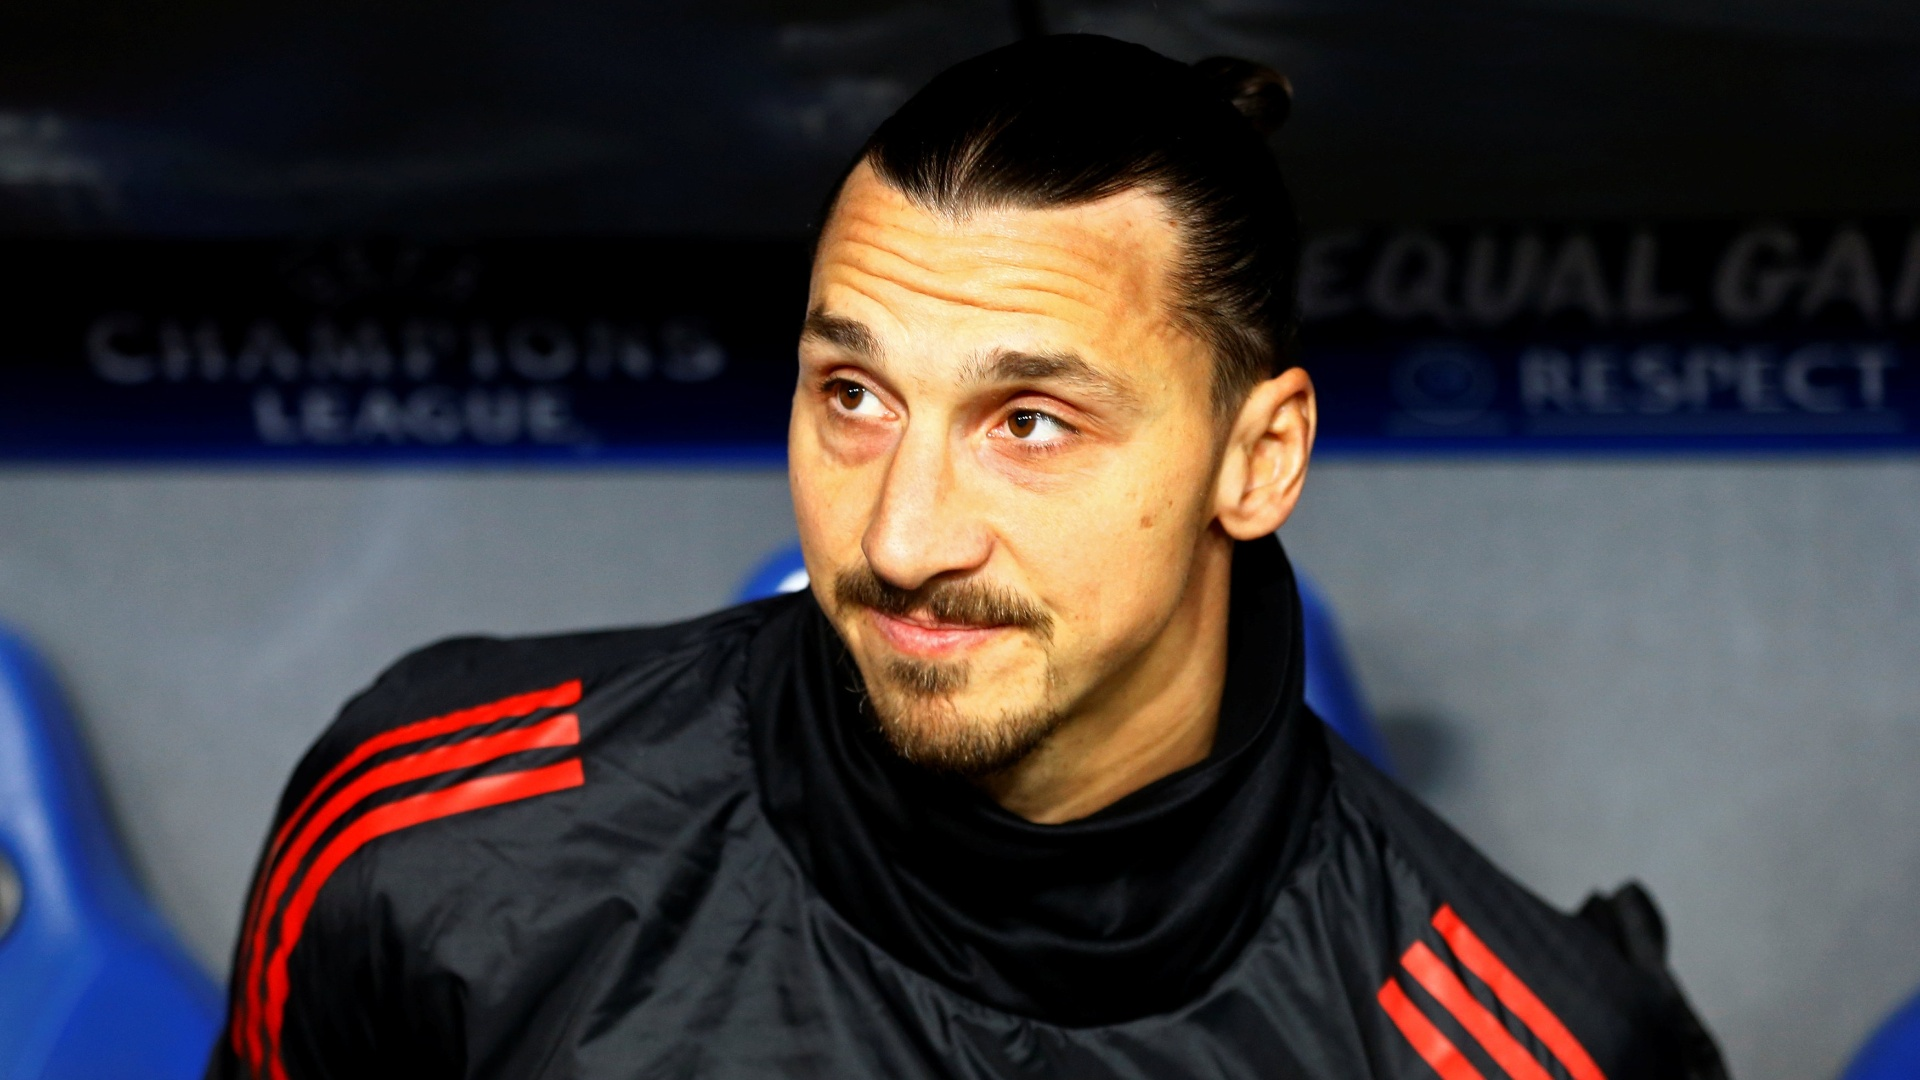 No banco, Ibrahimovic acompanha jogo entre Basel e Manchester United